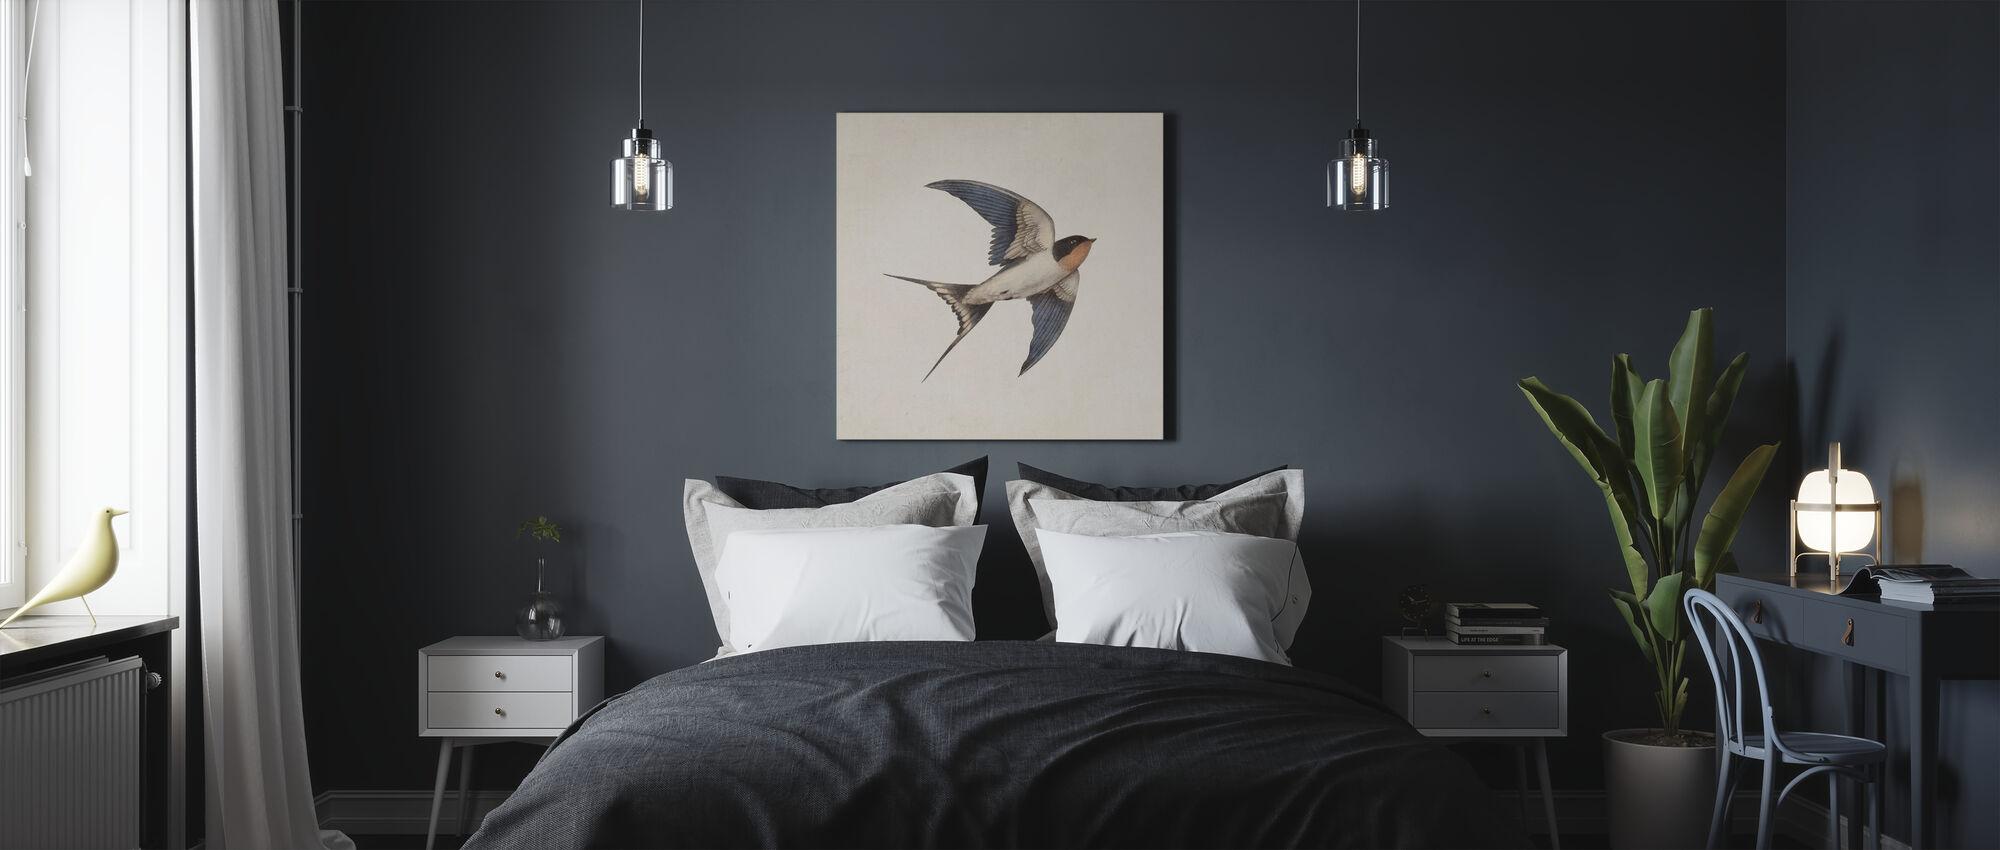 Barn Swallow - Canvas print - Bedroom